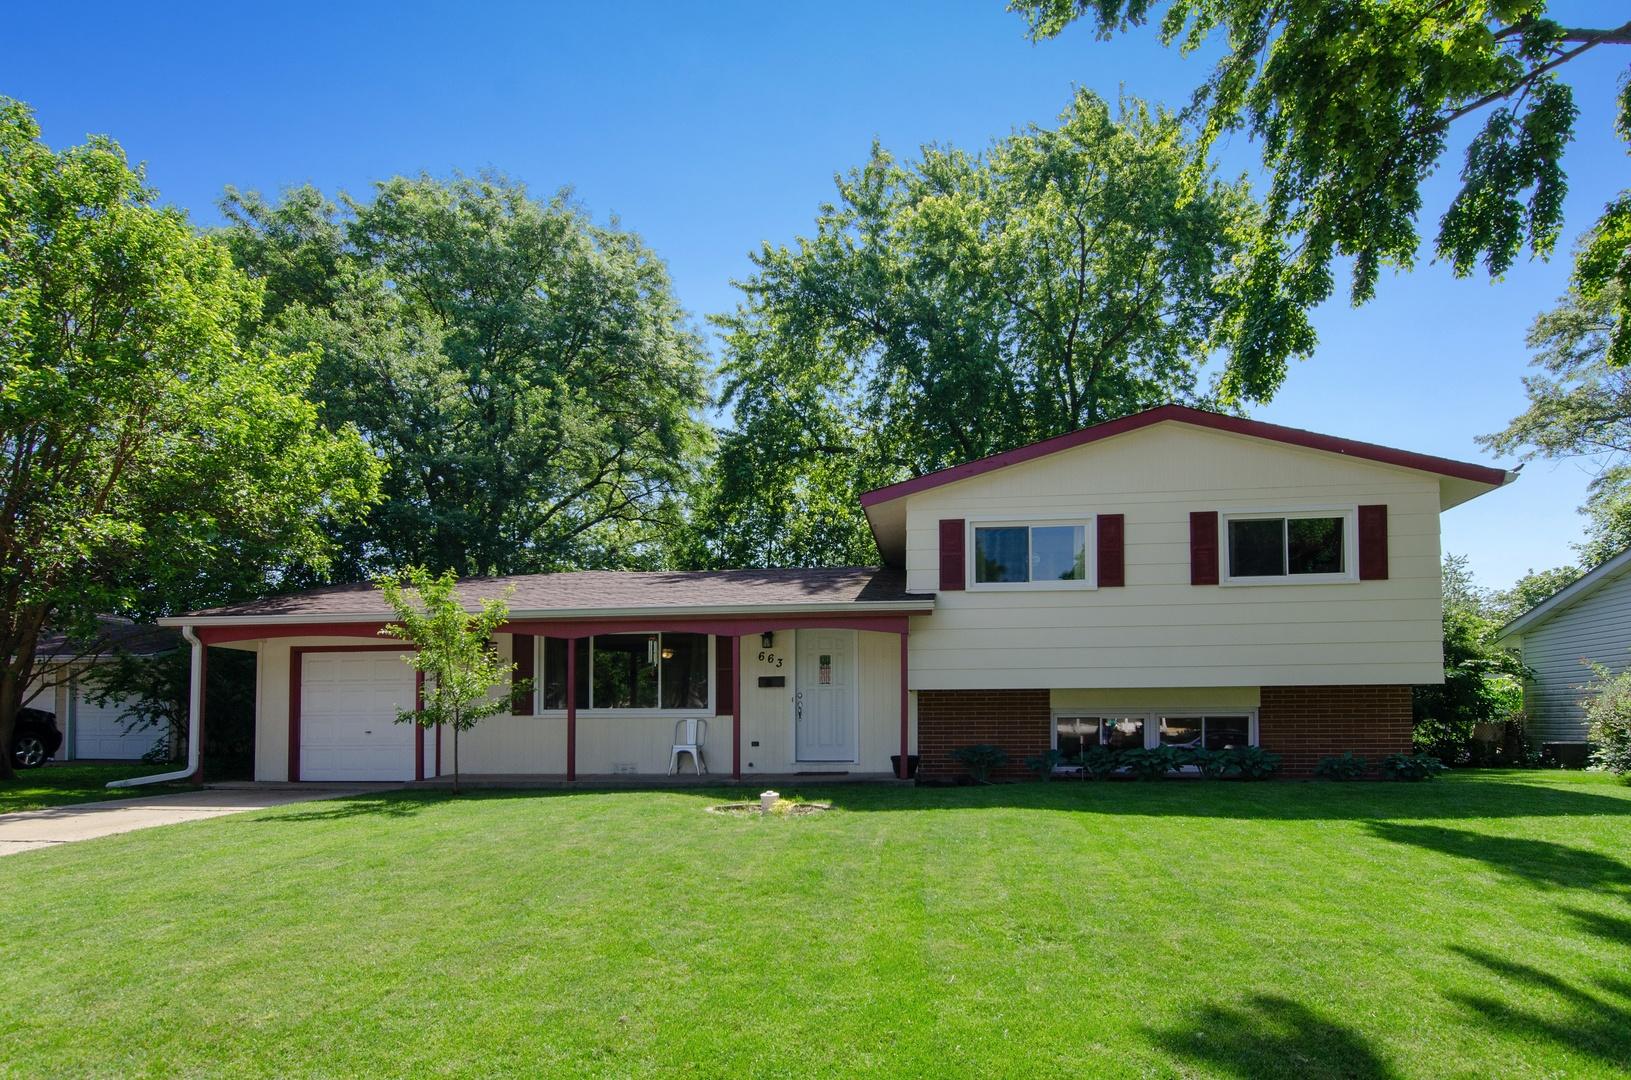 663 Devonshire ,Crystal Lake, Illinois 60014